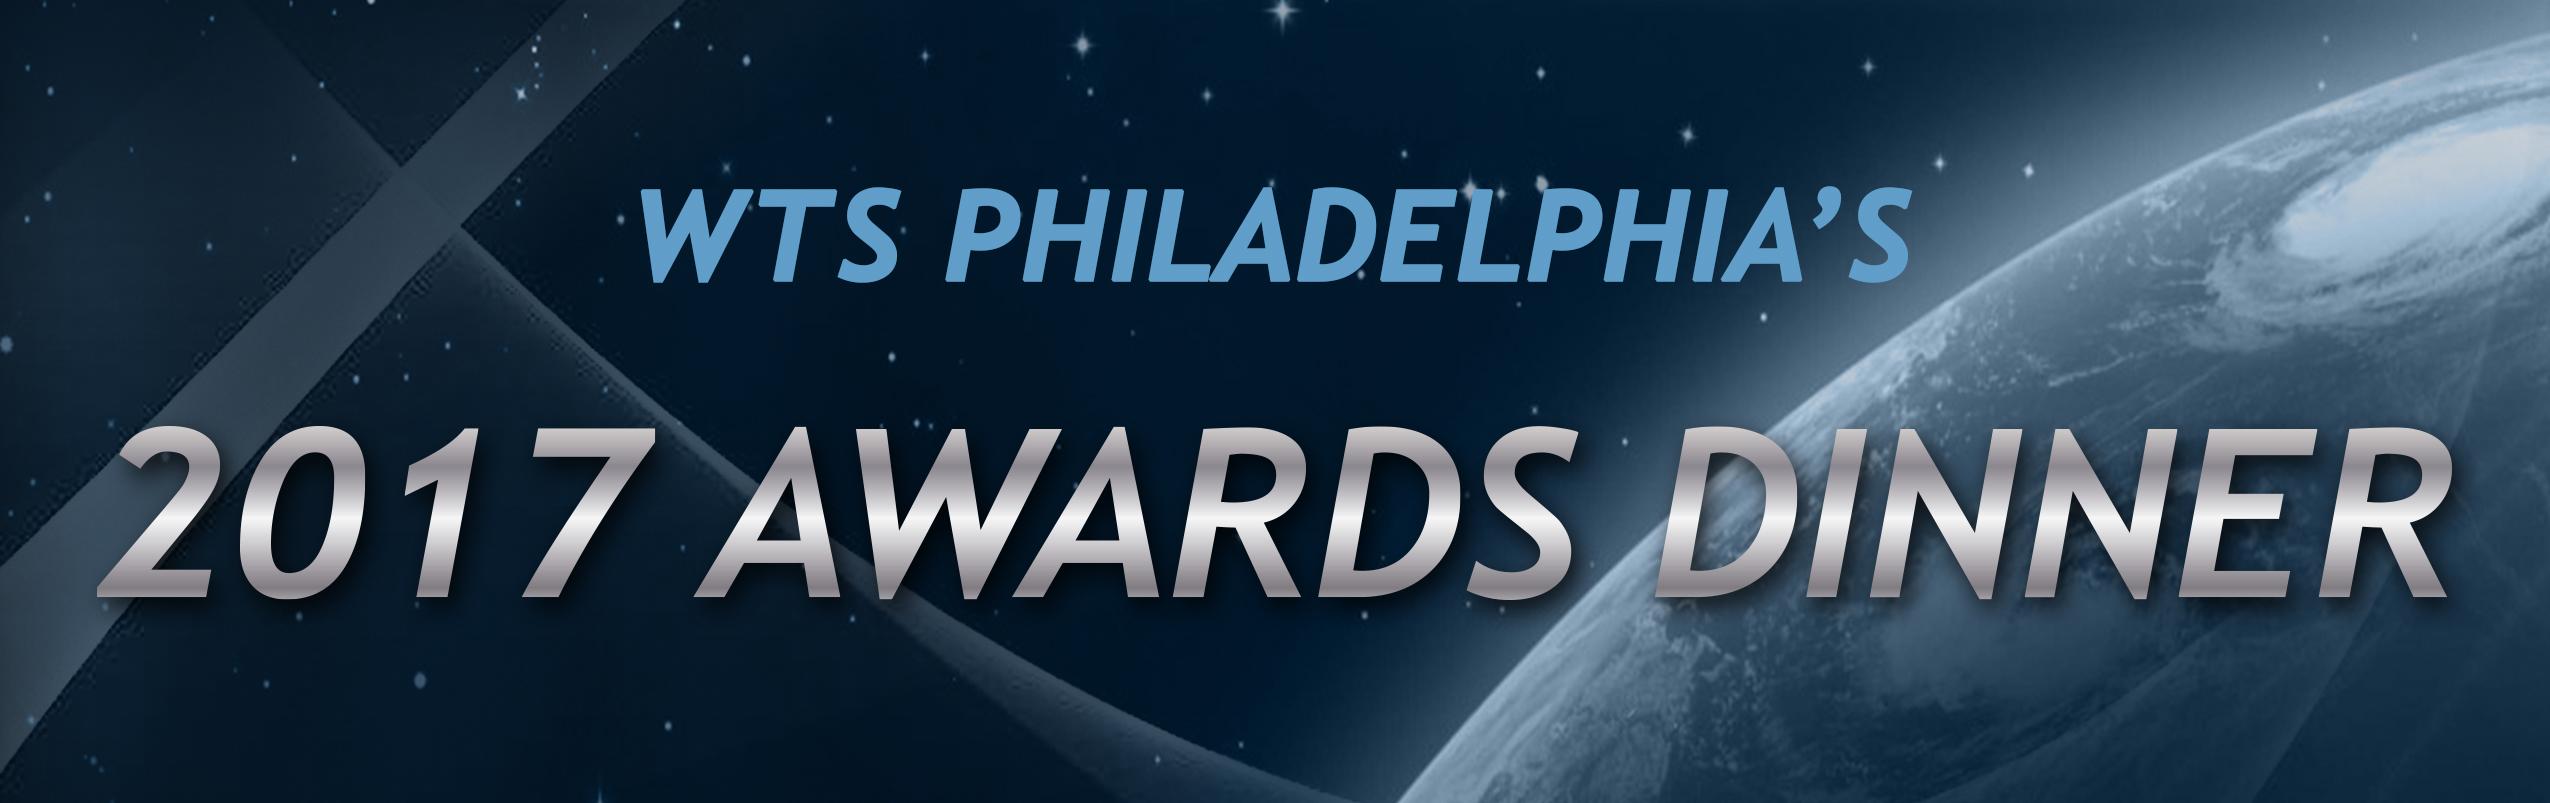 WTS_Header_Annual Awards Banquet_Awards_2017_10-25